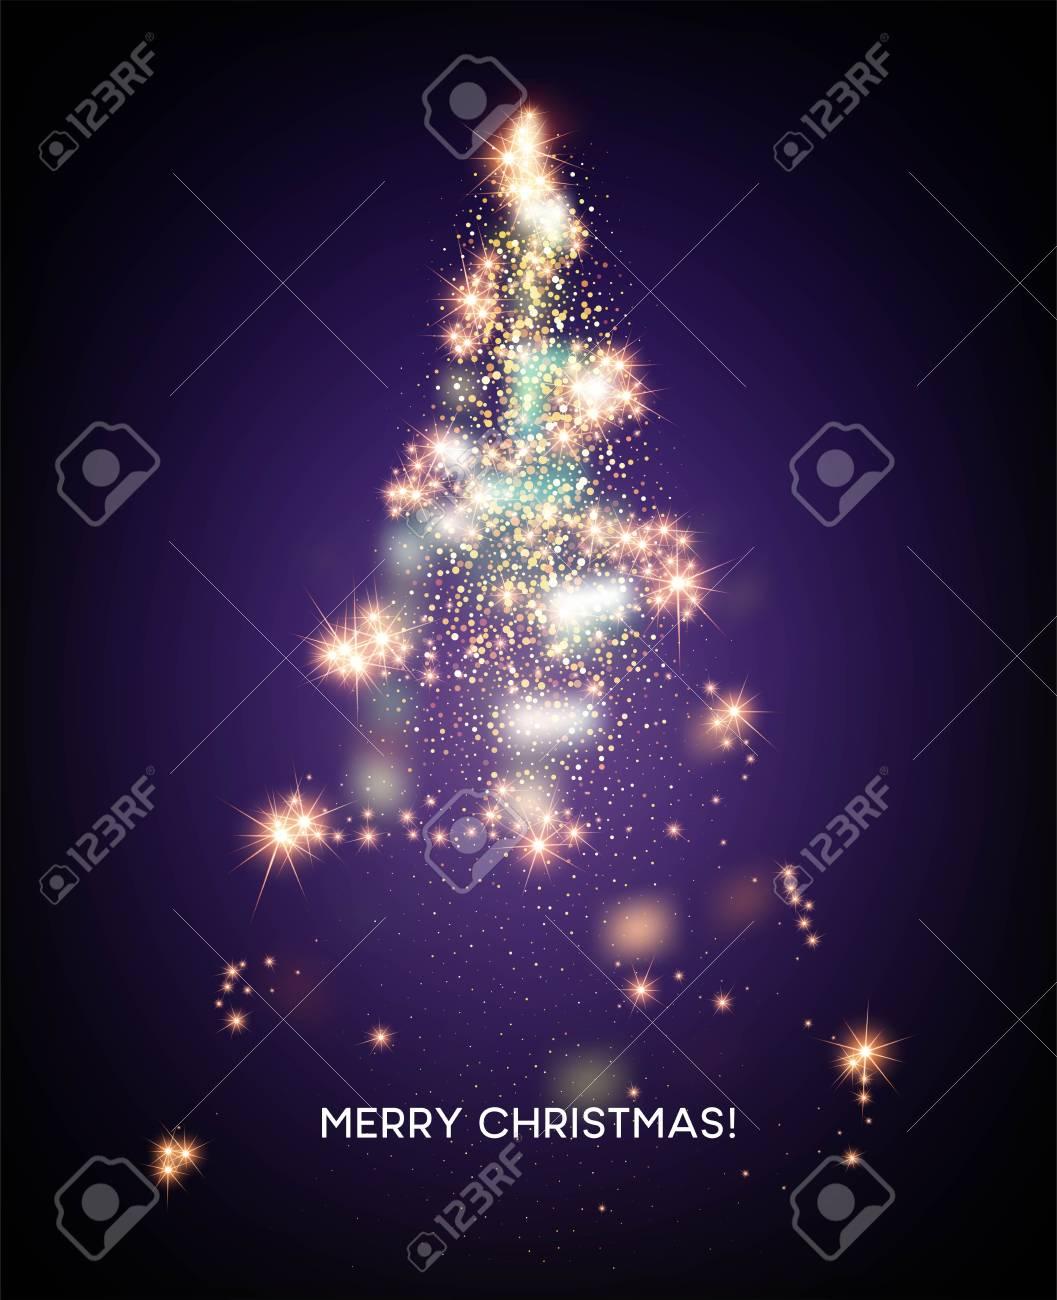 Shining Christmas tree. Light star background. Vector illustration EPS10 - 108593736